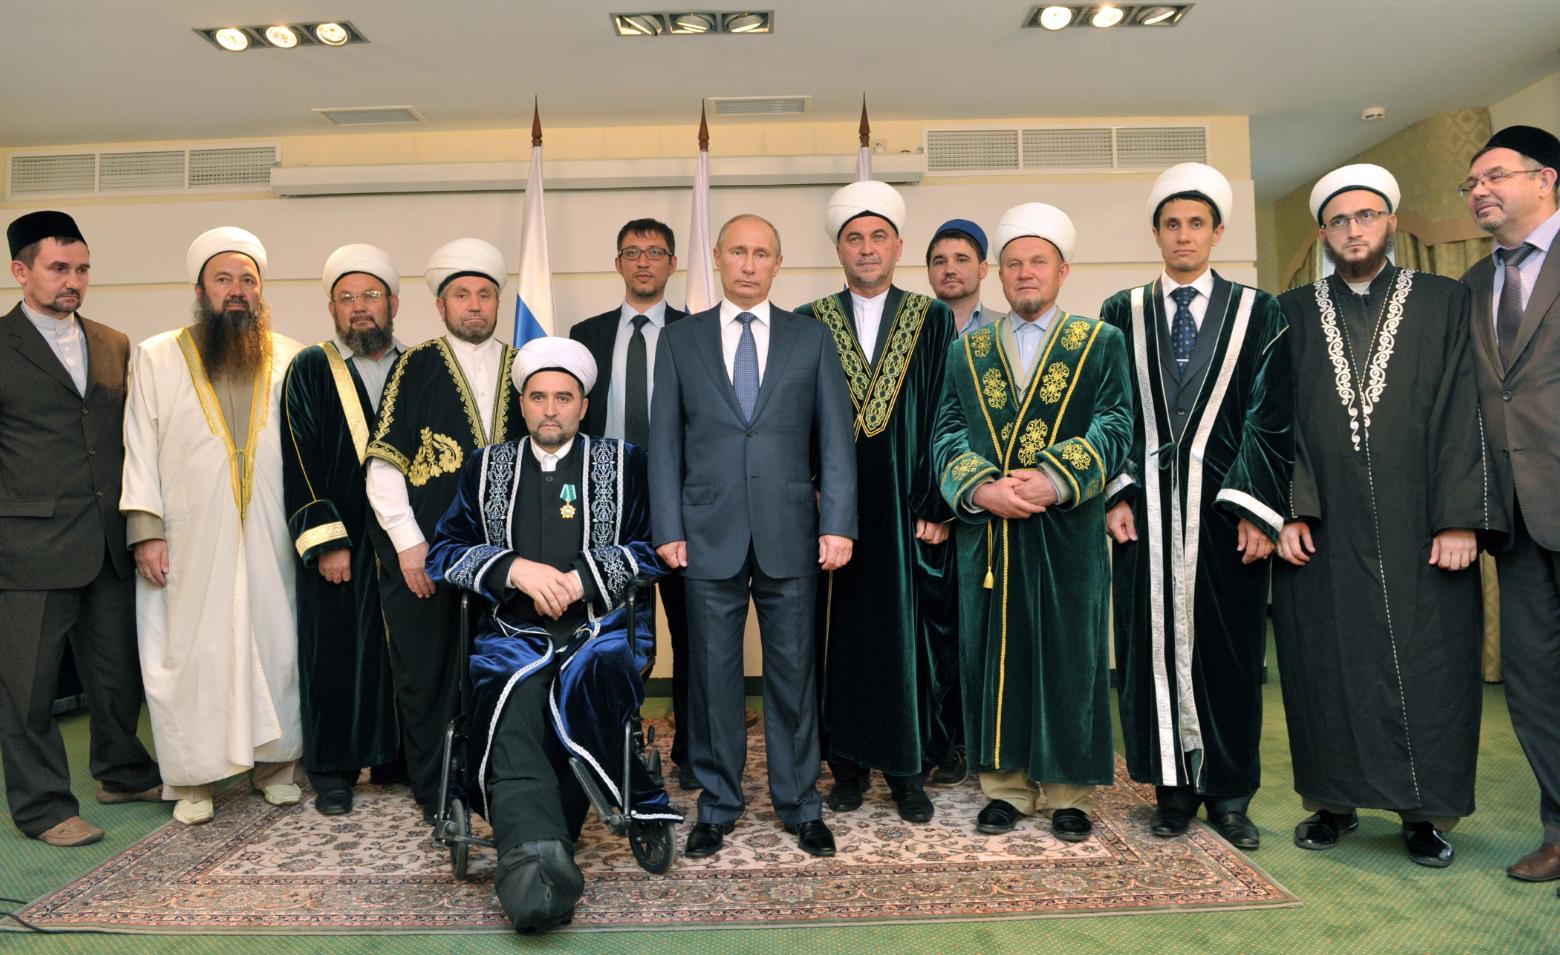 Russian President Vladimir Putin with the Russia's Muslim clergy in 2012. Source: Aleksey Nikolsky/RIA Novosti